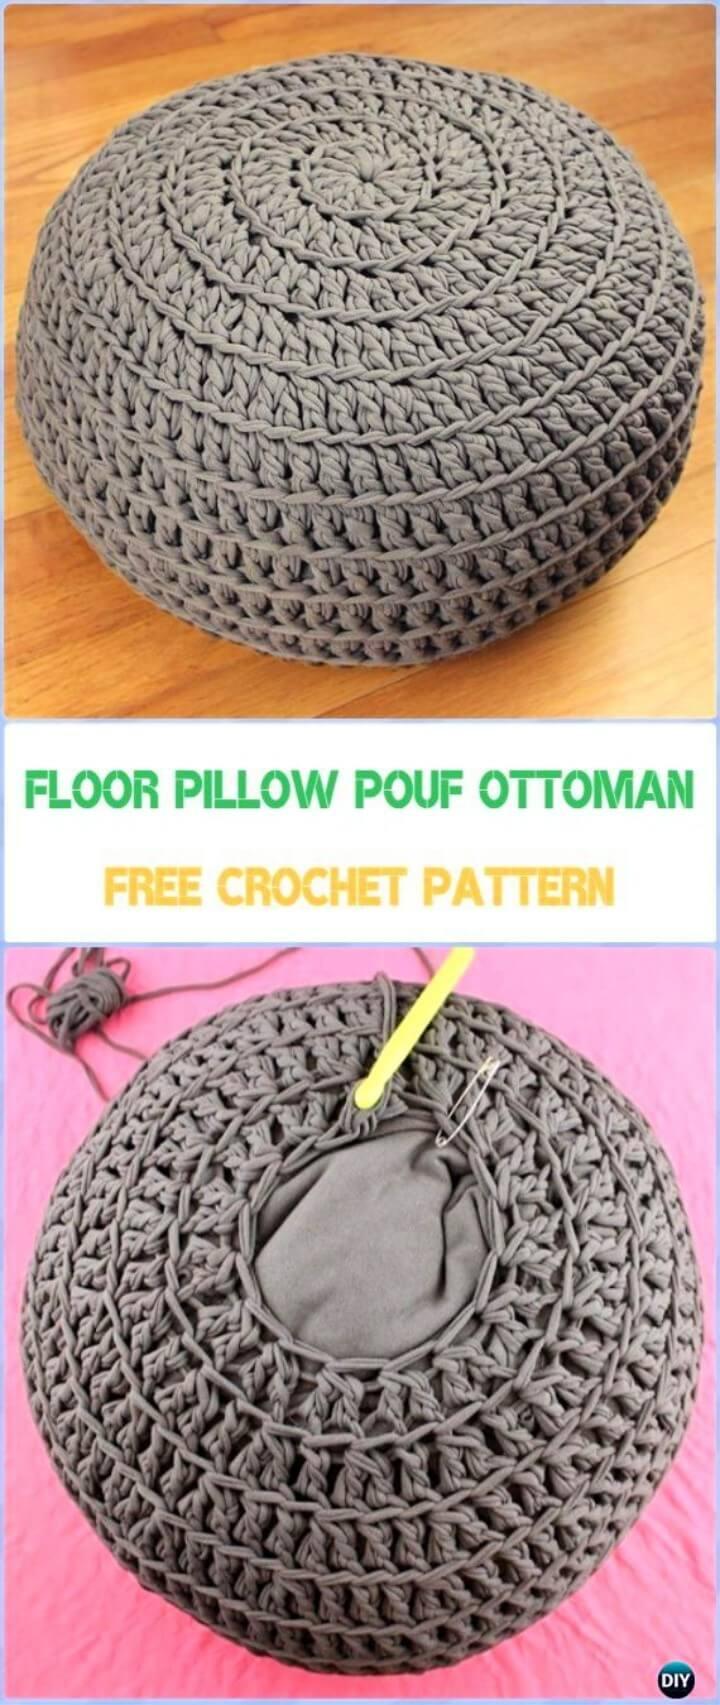 Floor Pillow Pouf Ottoman